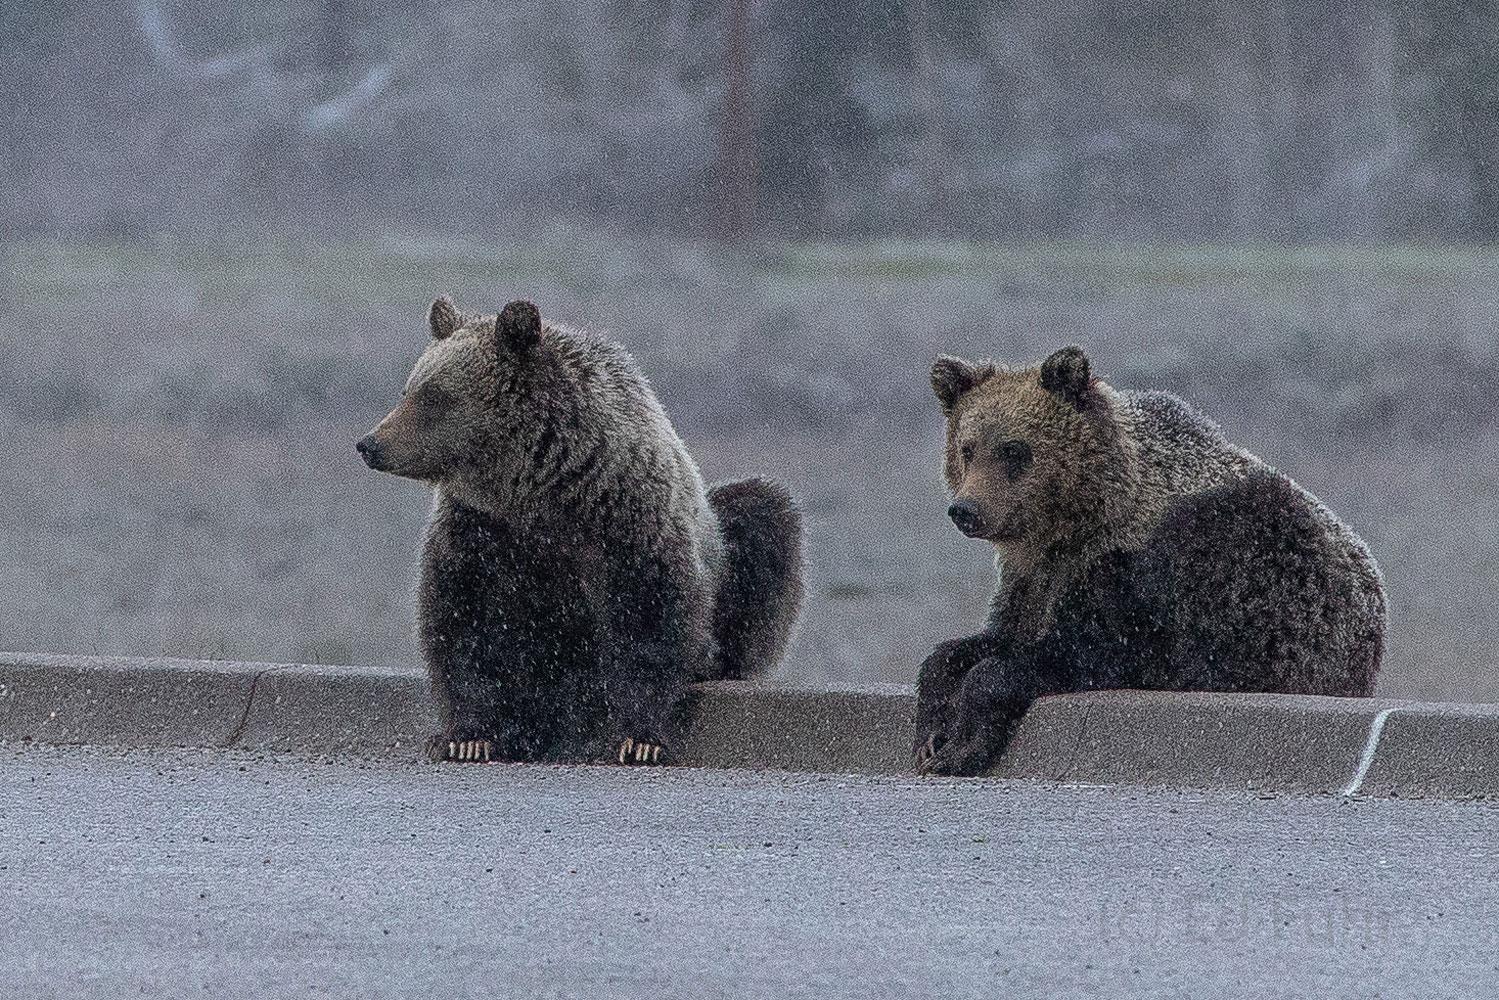 Blondie, Subadult, cubs, 2019, grizzly, bear, Tetons, Grand Teton, photo